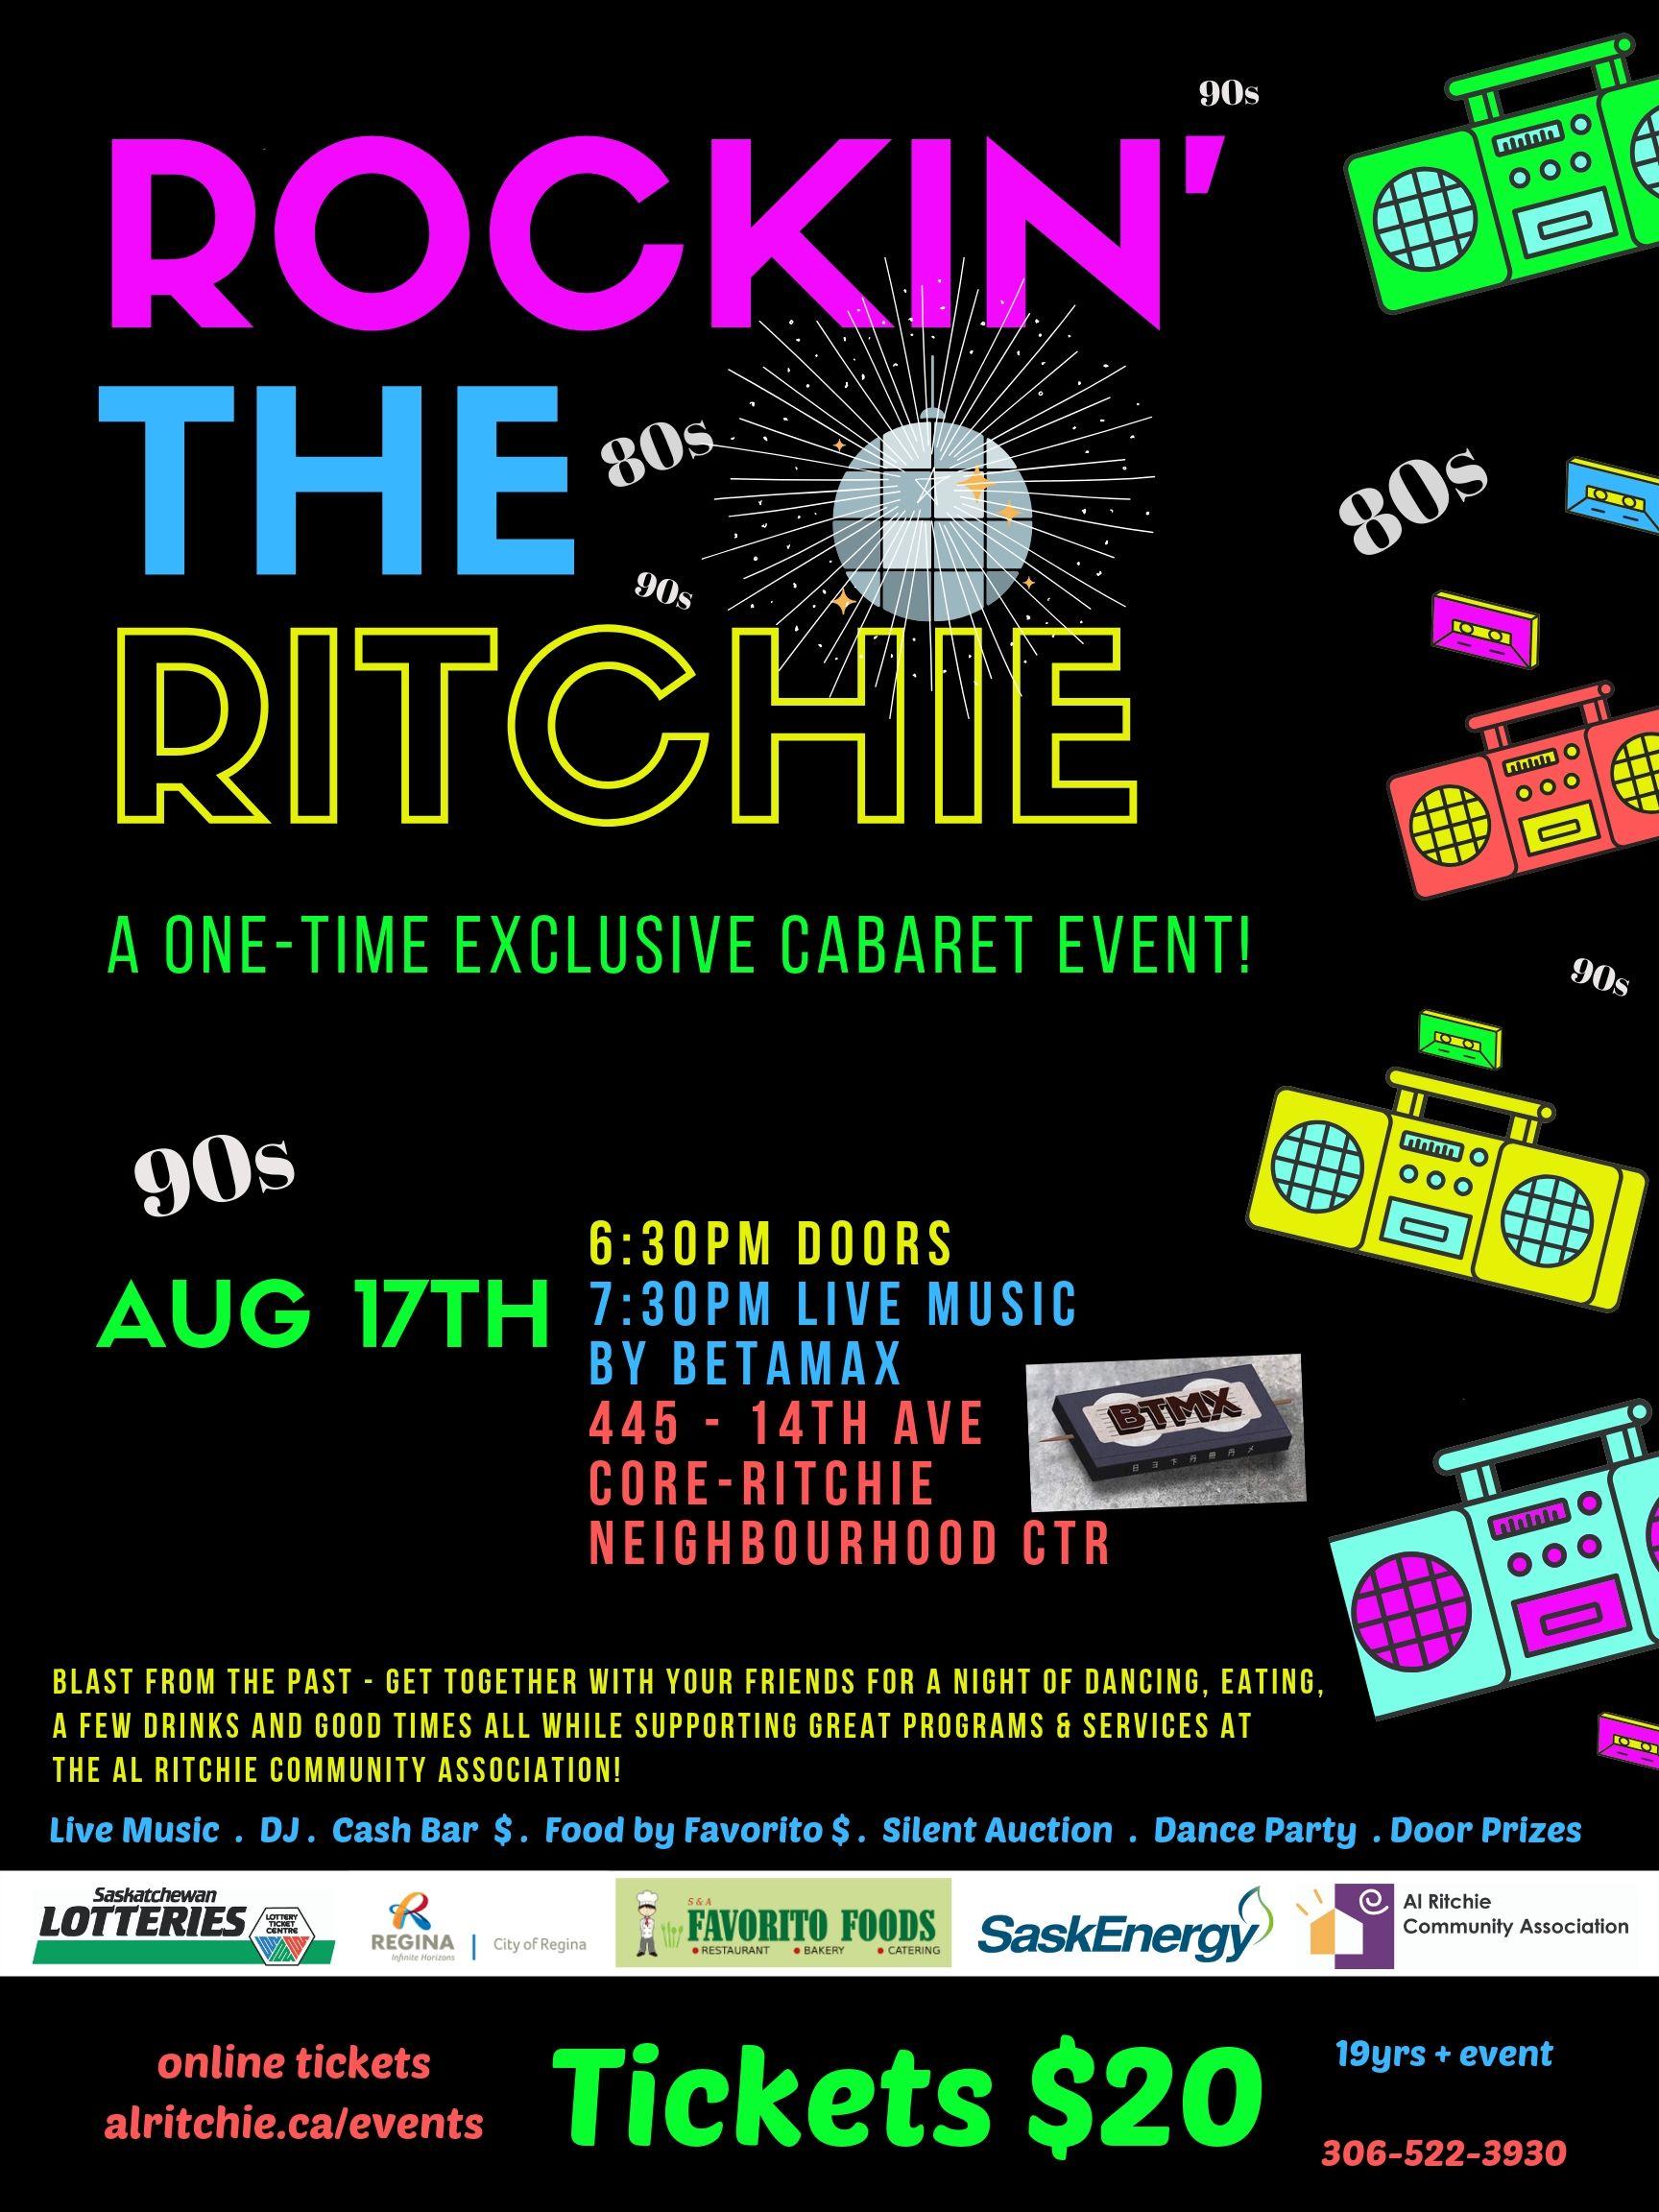 Rockin the Ritchie